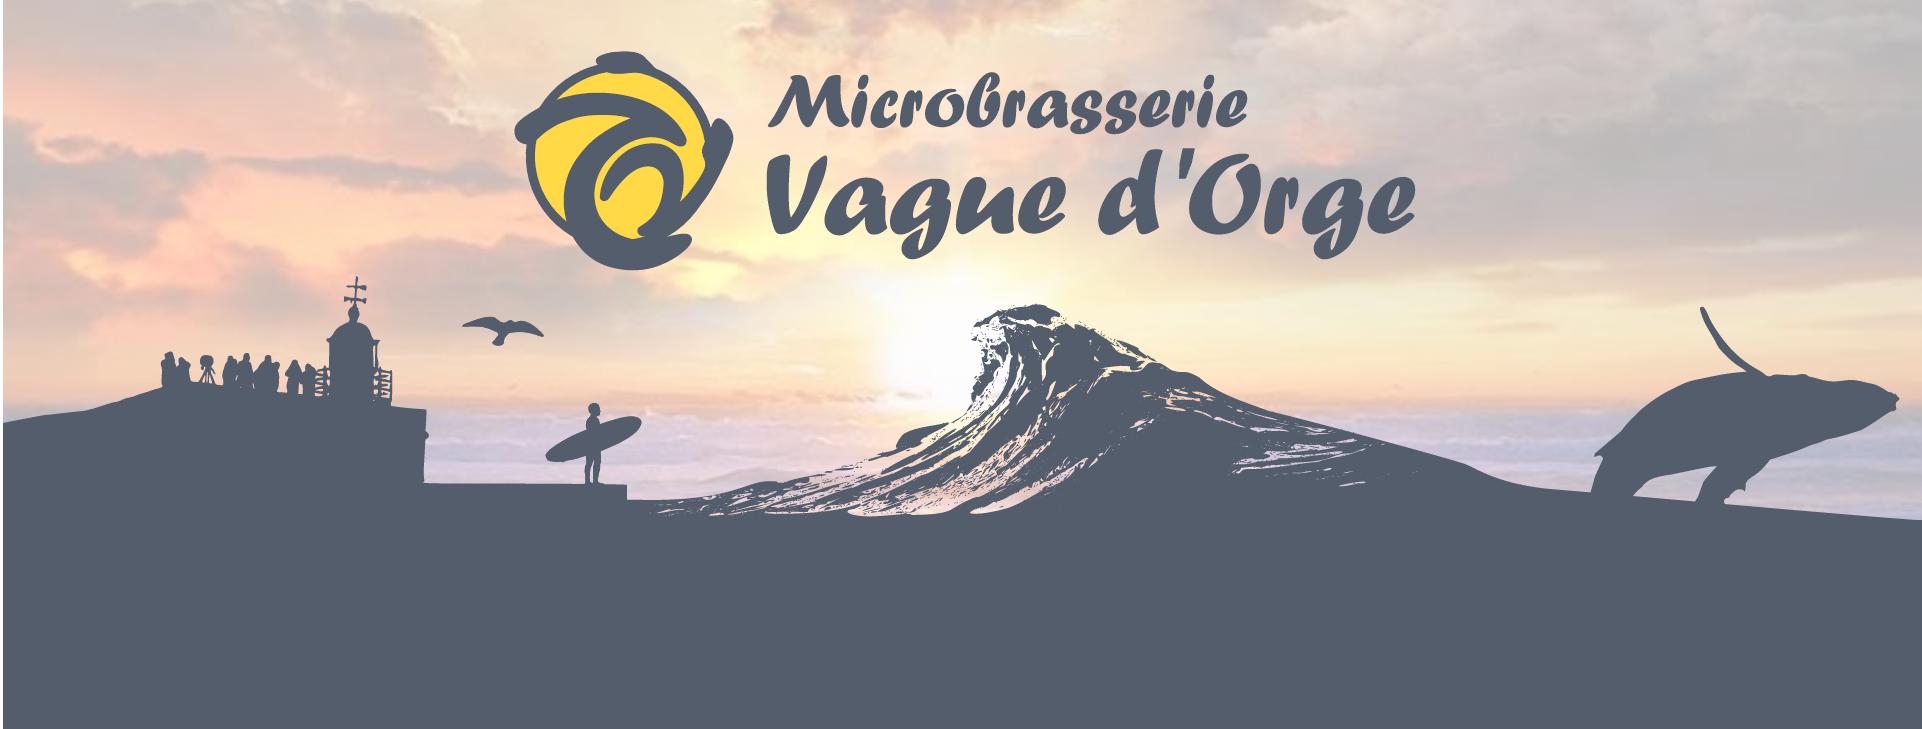 Microbrasserie Vague dOrge